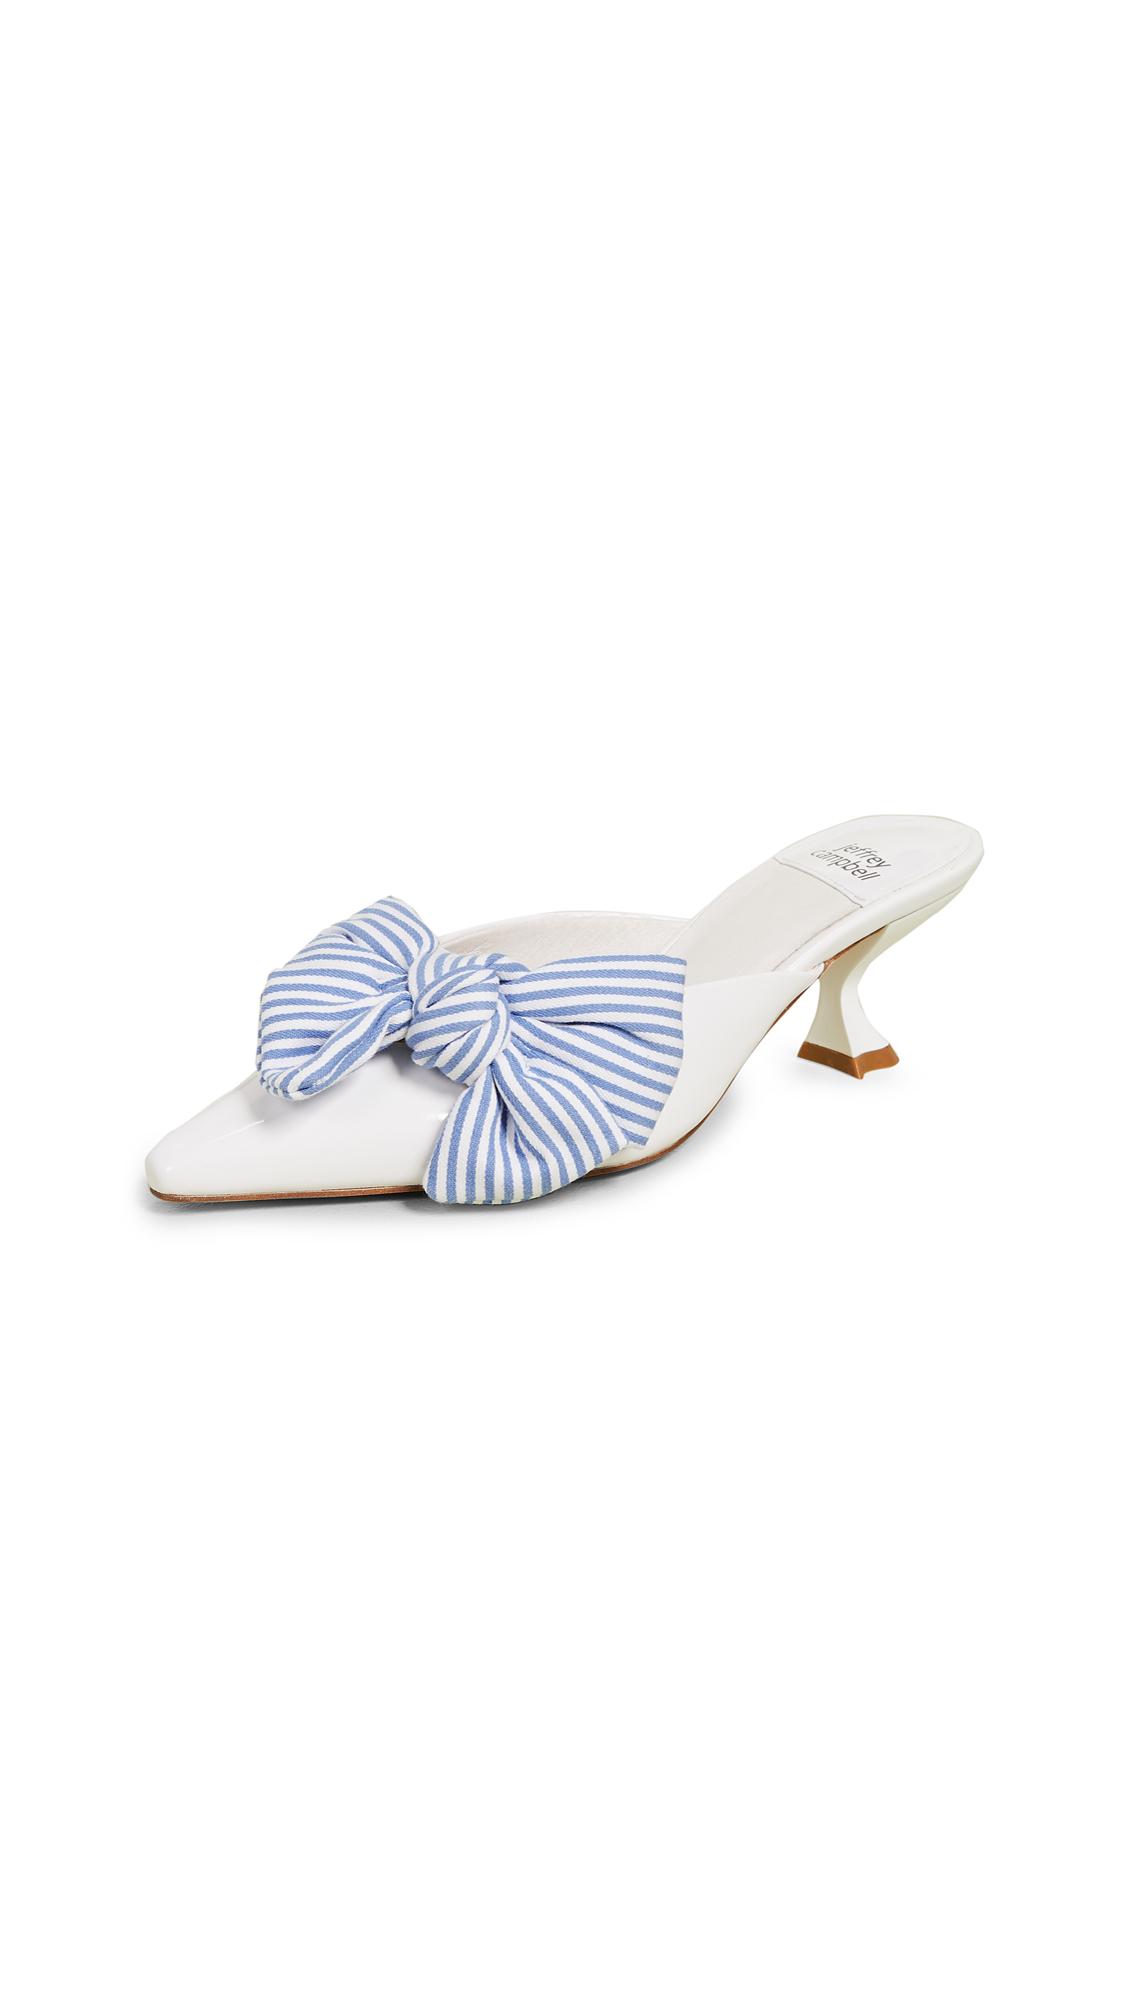 Jeffrey Campbell Adorn Kitten Heel Mules - White Patent Blue Shirt